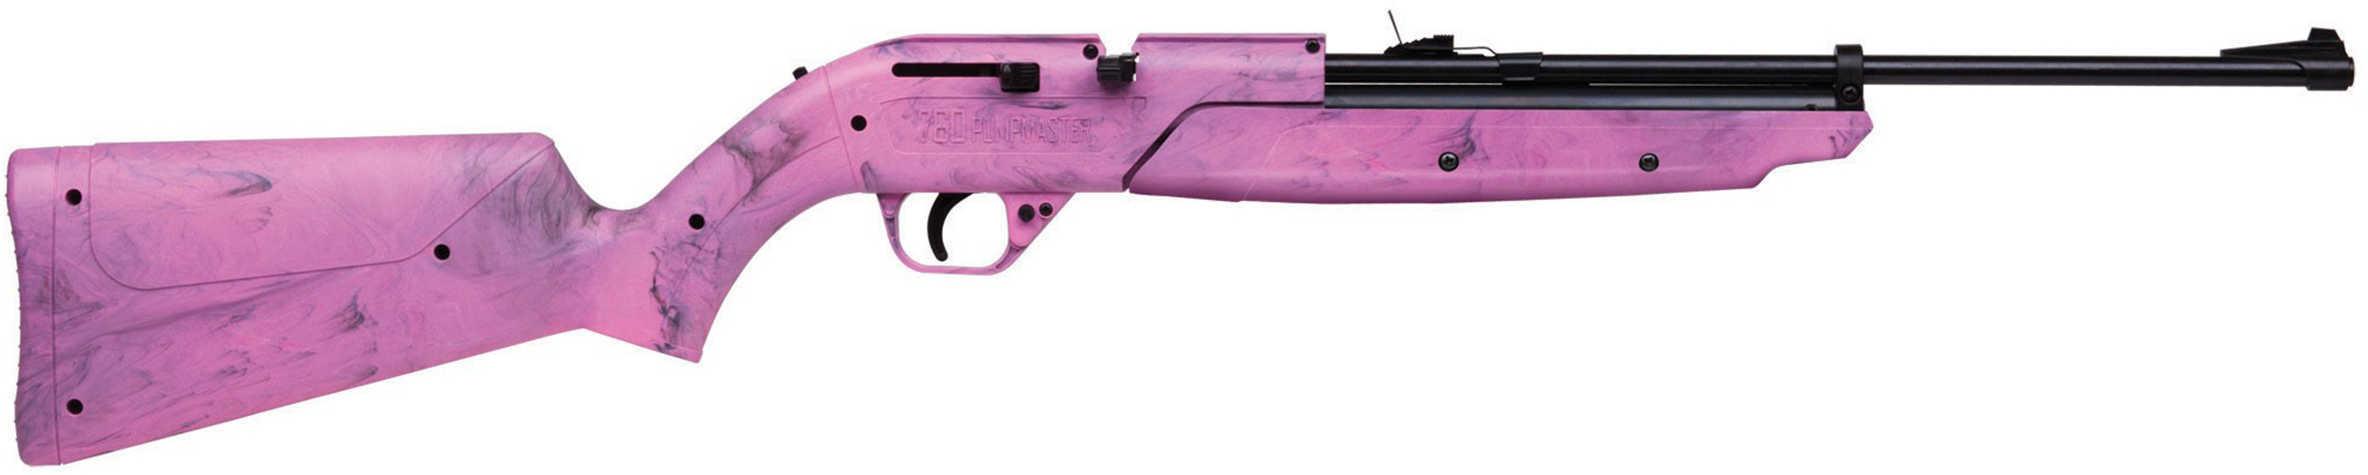 Crosman PUMPMASTER Pink 177 Caliber 760P